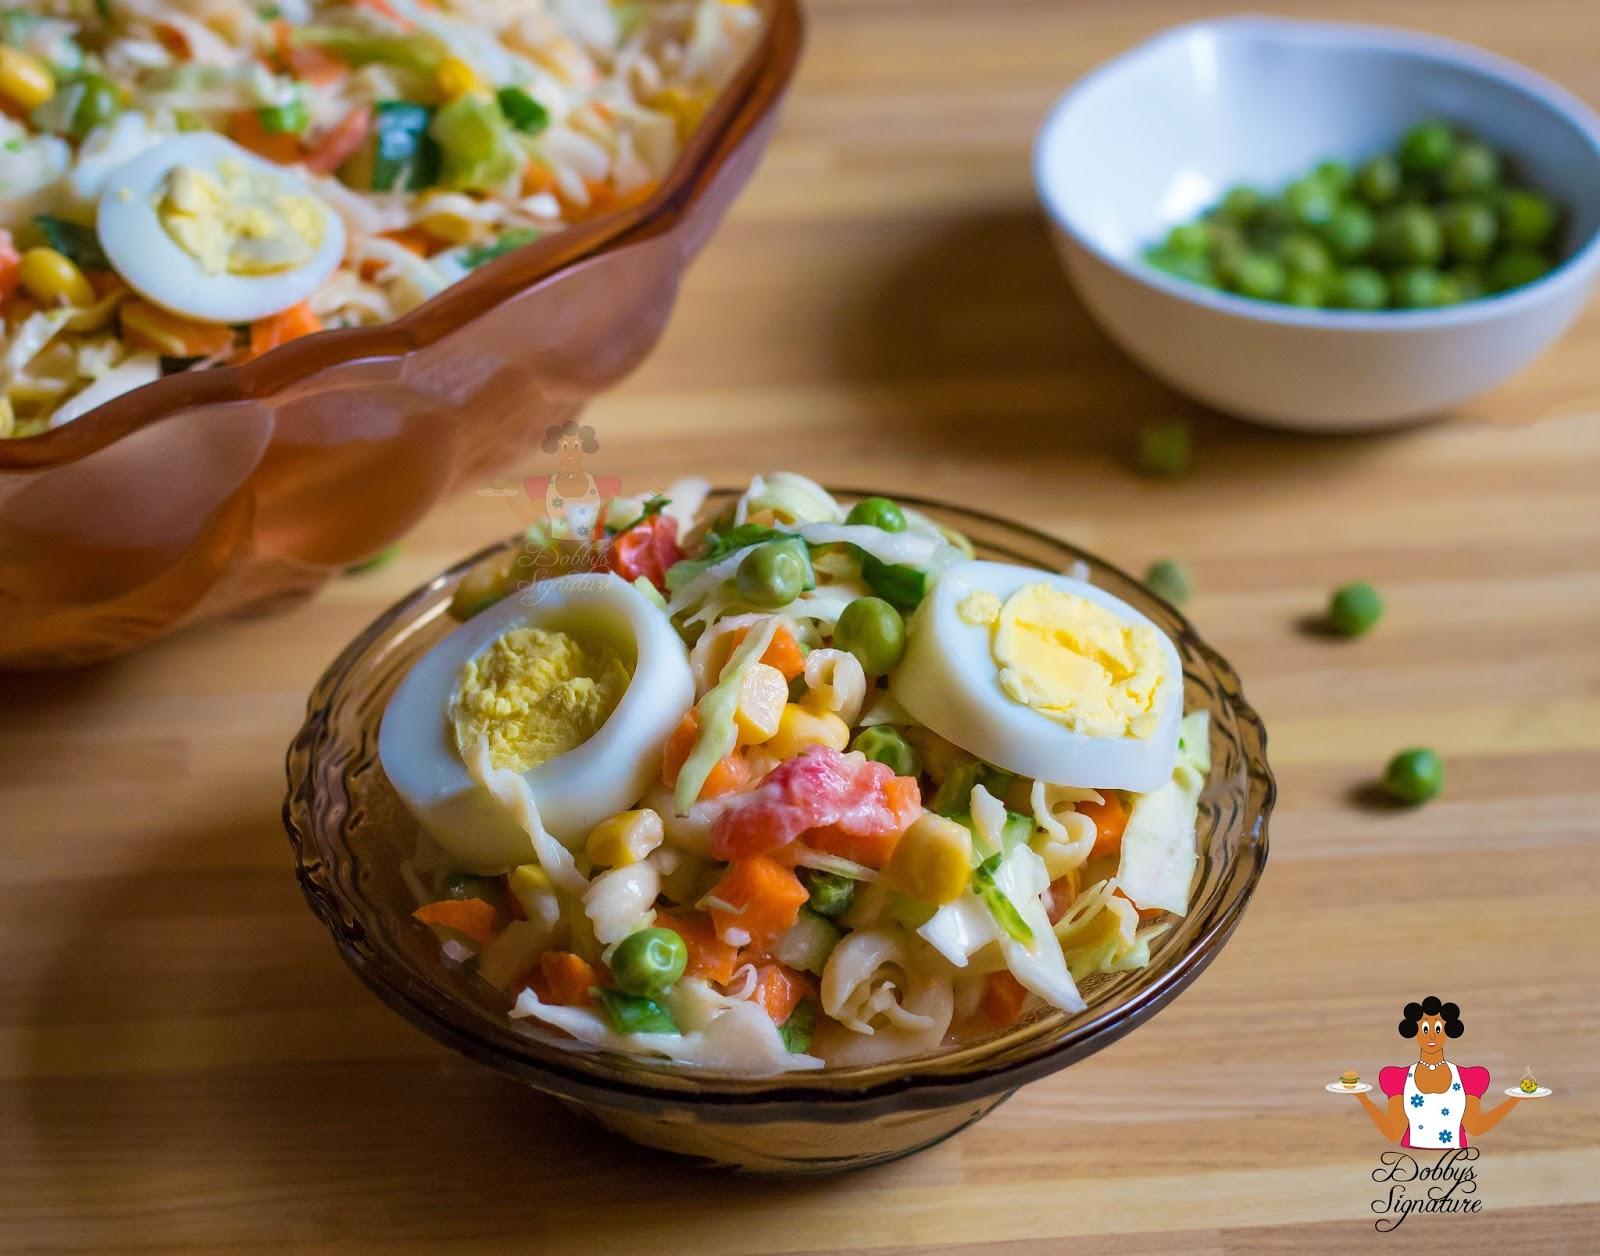 Dobbys signature nigerian food blog i nigerian food recipes i vegetable salad recipe forumfinder Image collections